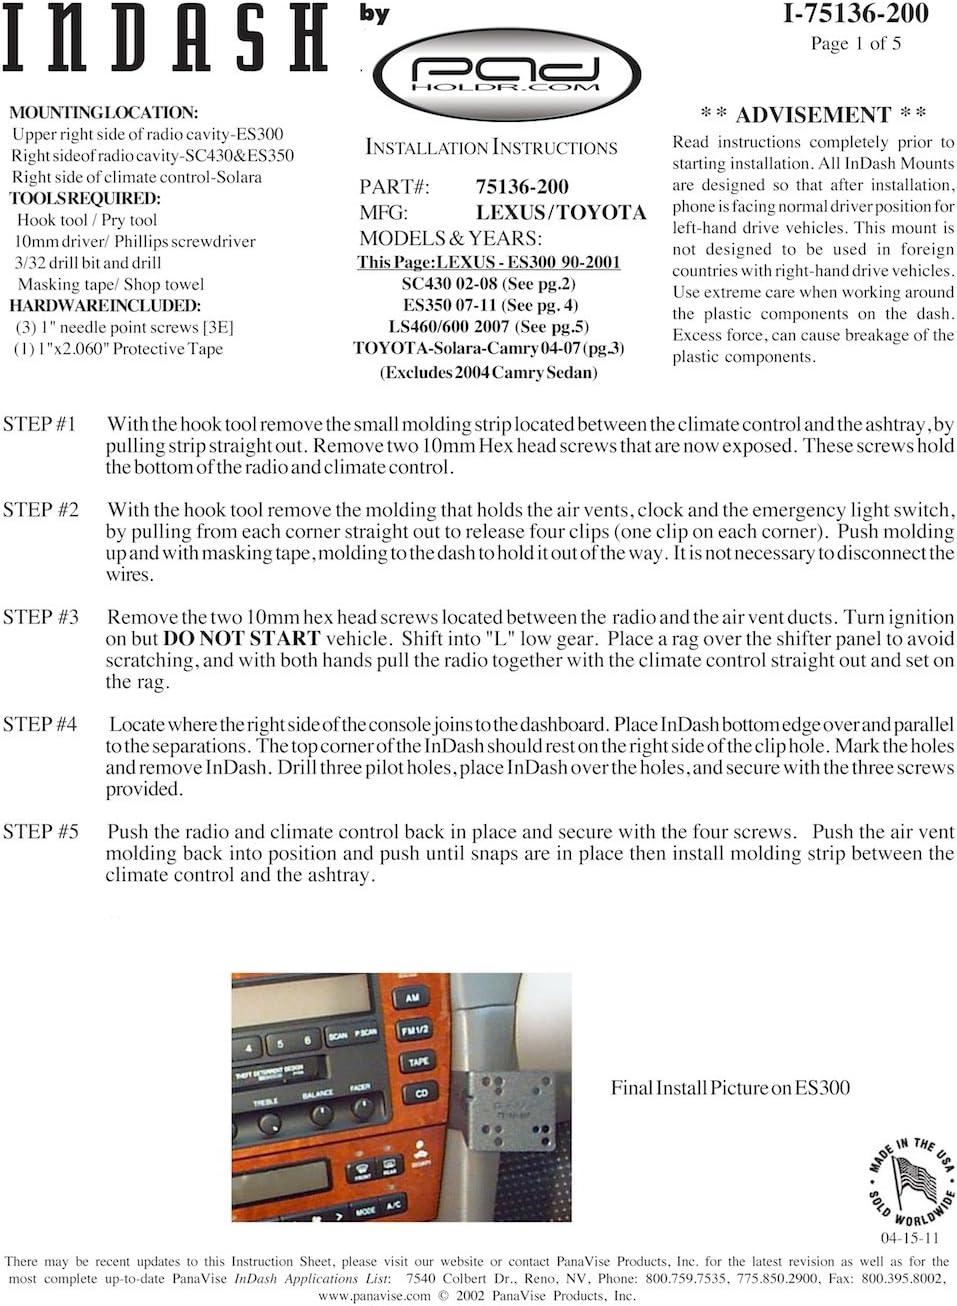 Padholdr Utility Series Premium Locking Tablet Dash Kit for 2004-2008 Toyota Solara Camry